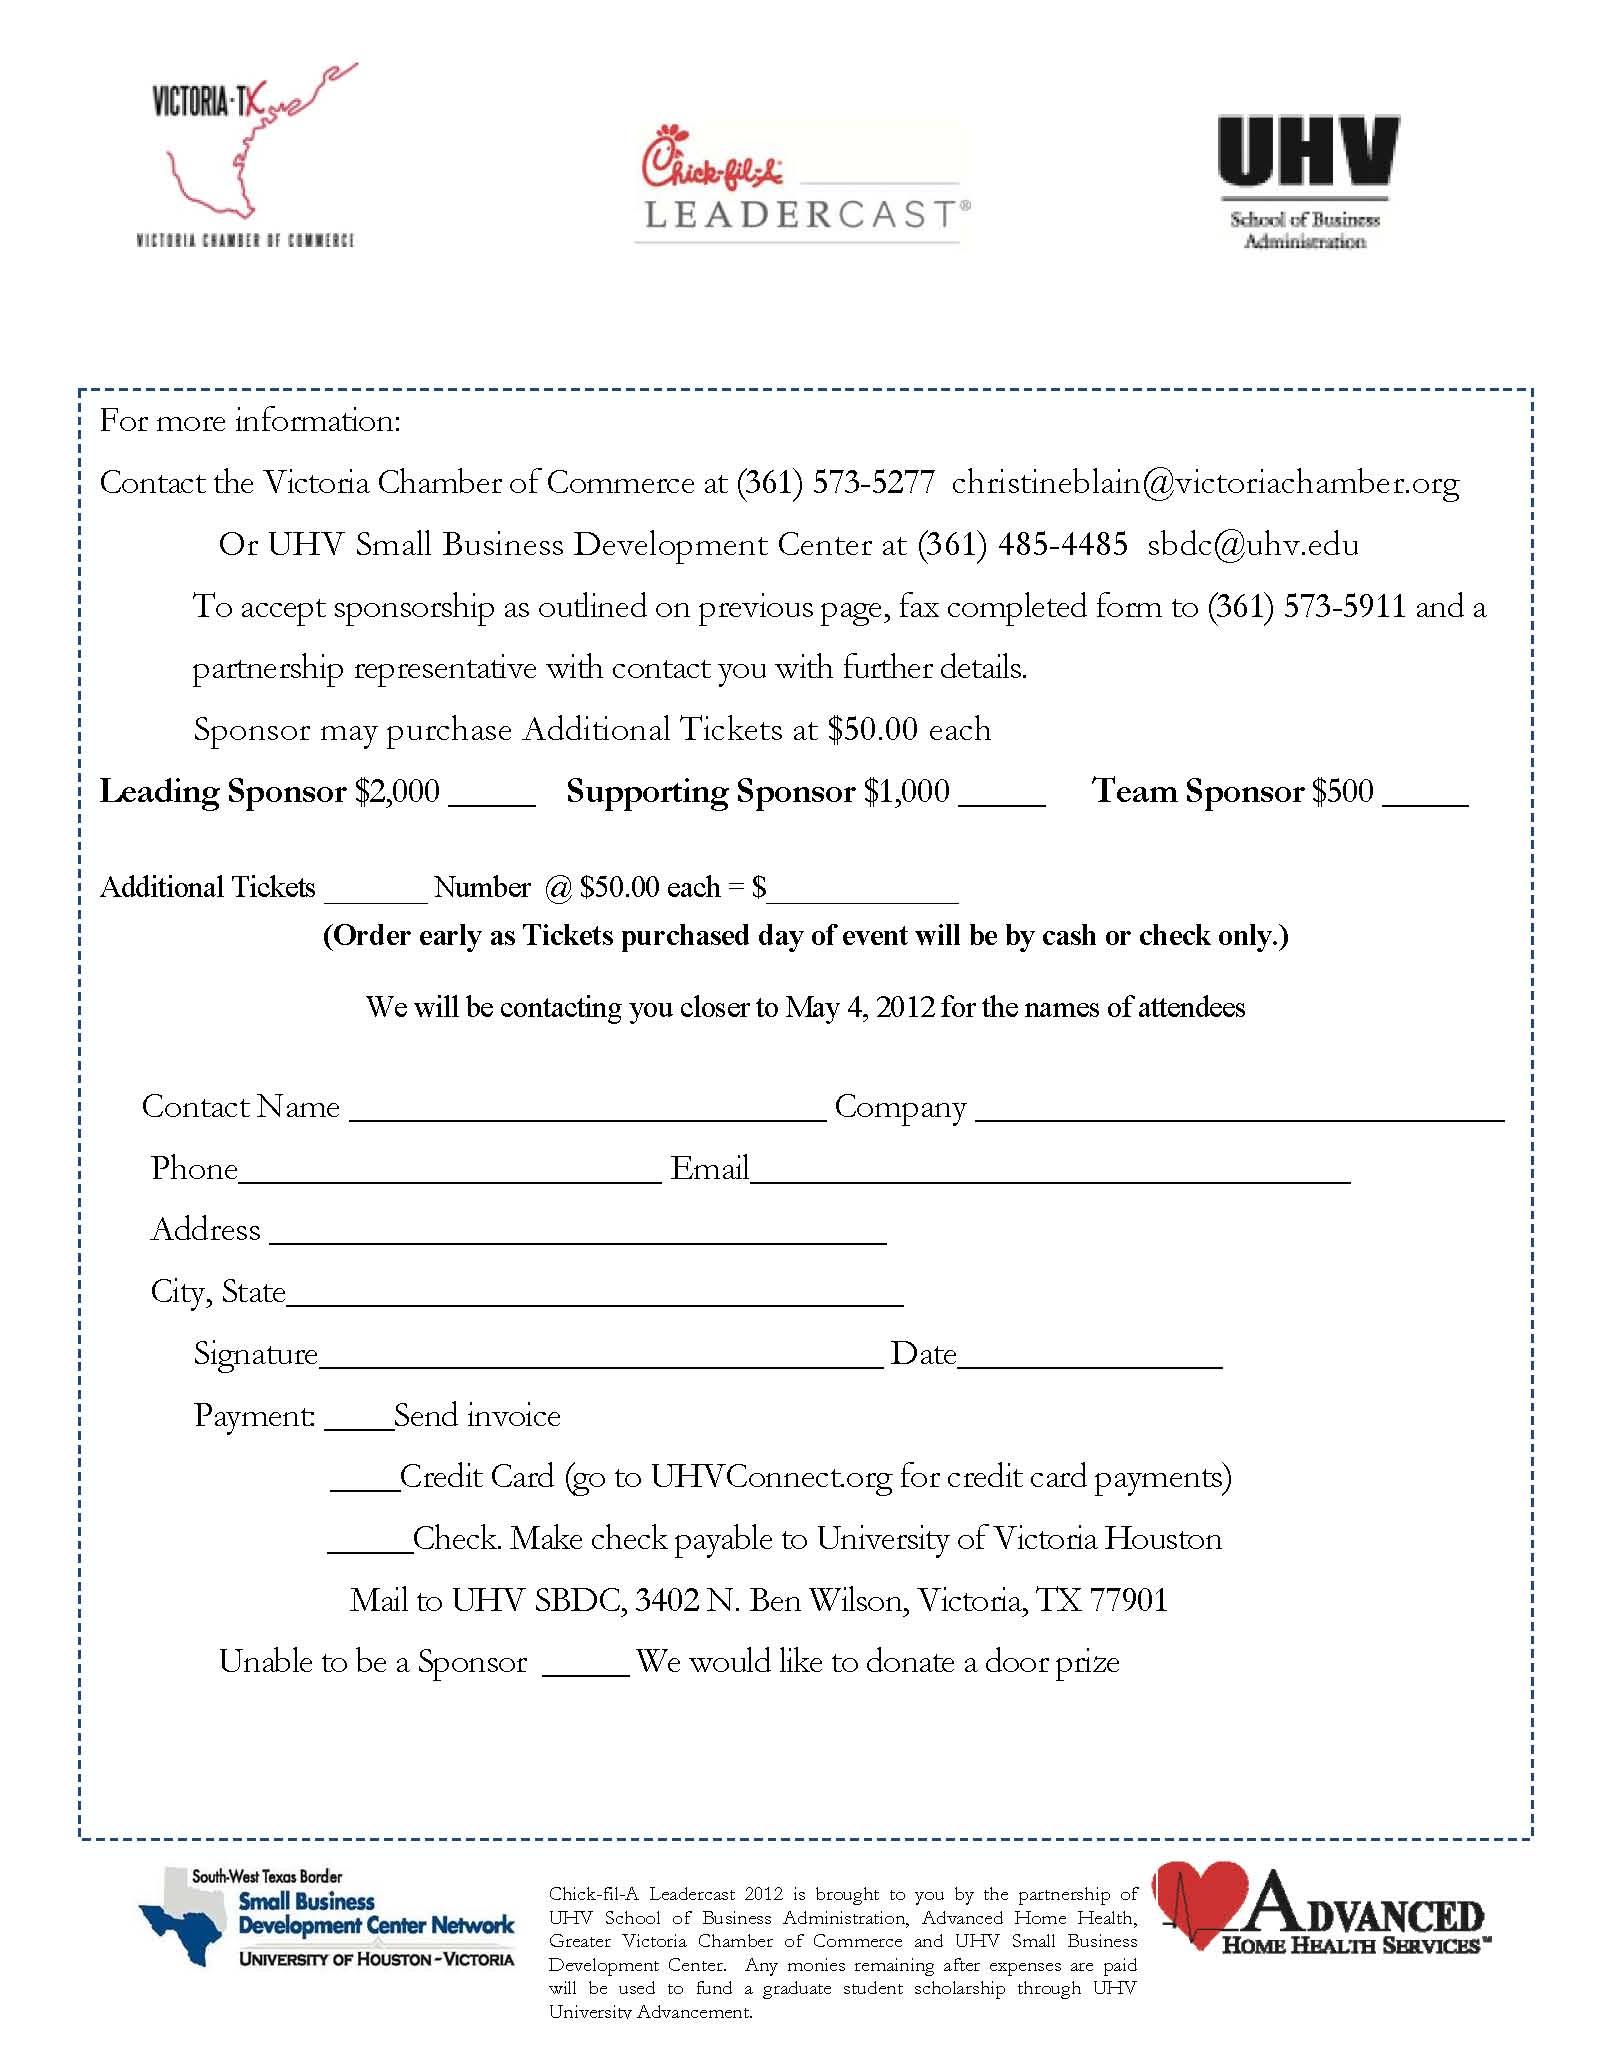 chick fil a job application form - Hong.hankk.co